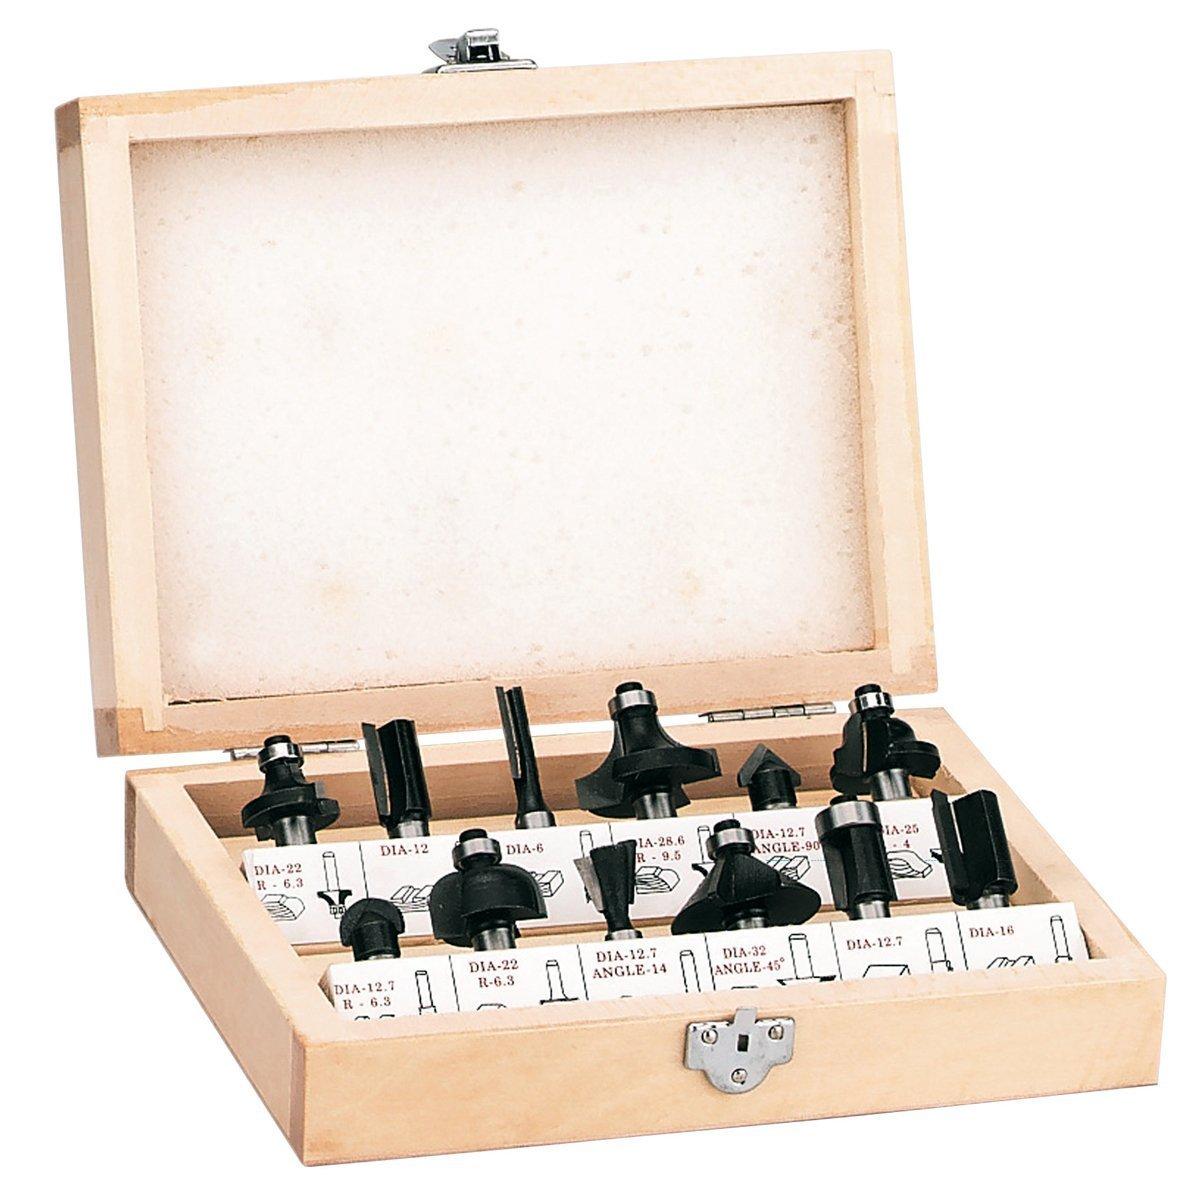 Einhell RT-RO 55 // BT-RO 1200 E  Pack de 12 fresas para madera color negro ref. 4350199 8 mm